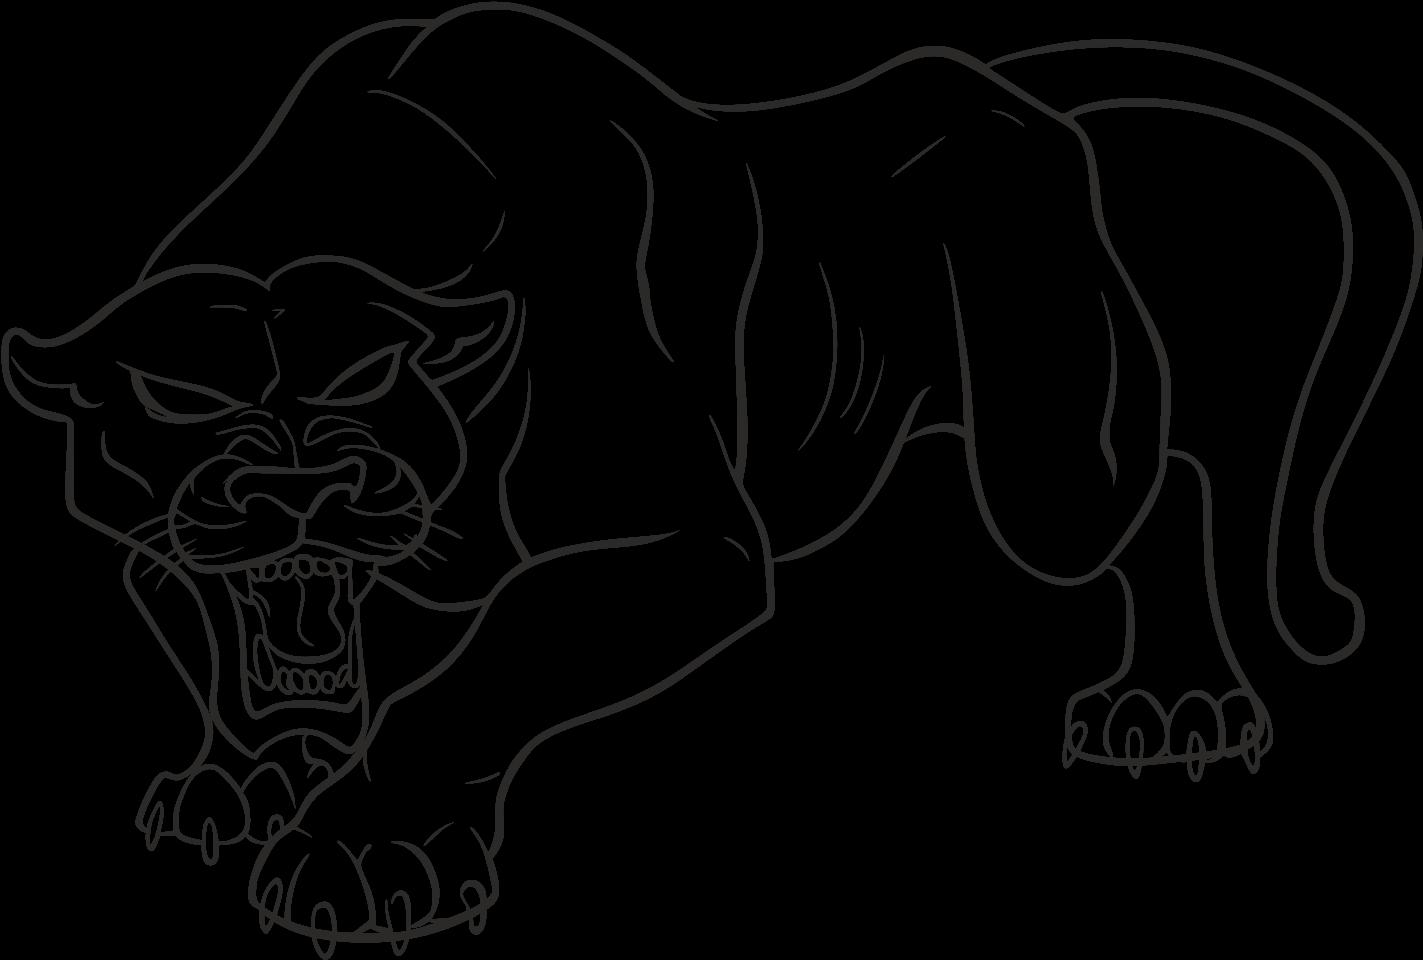 Download Panther Png Pic Black Panther Animal Drawing Full Size Png Image Pngkit